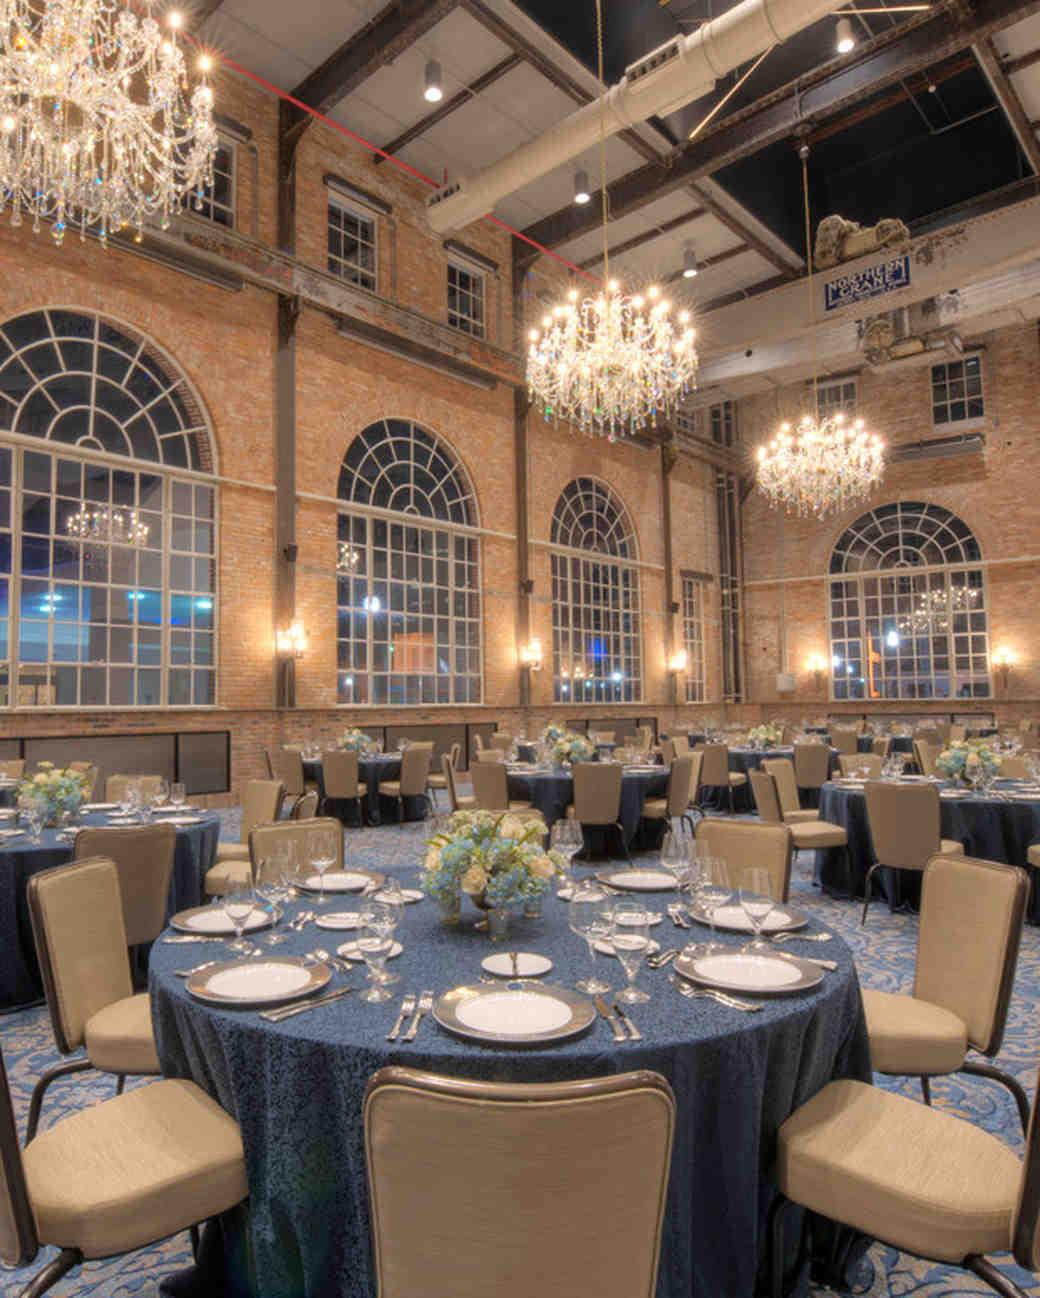 new venue indoor ballroom seating